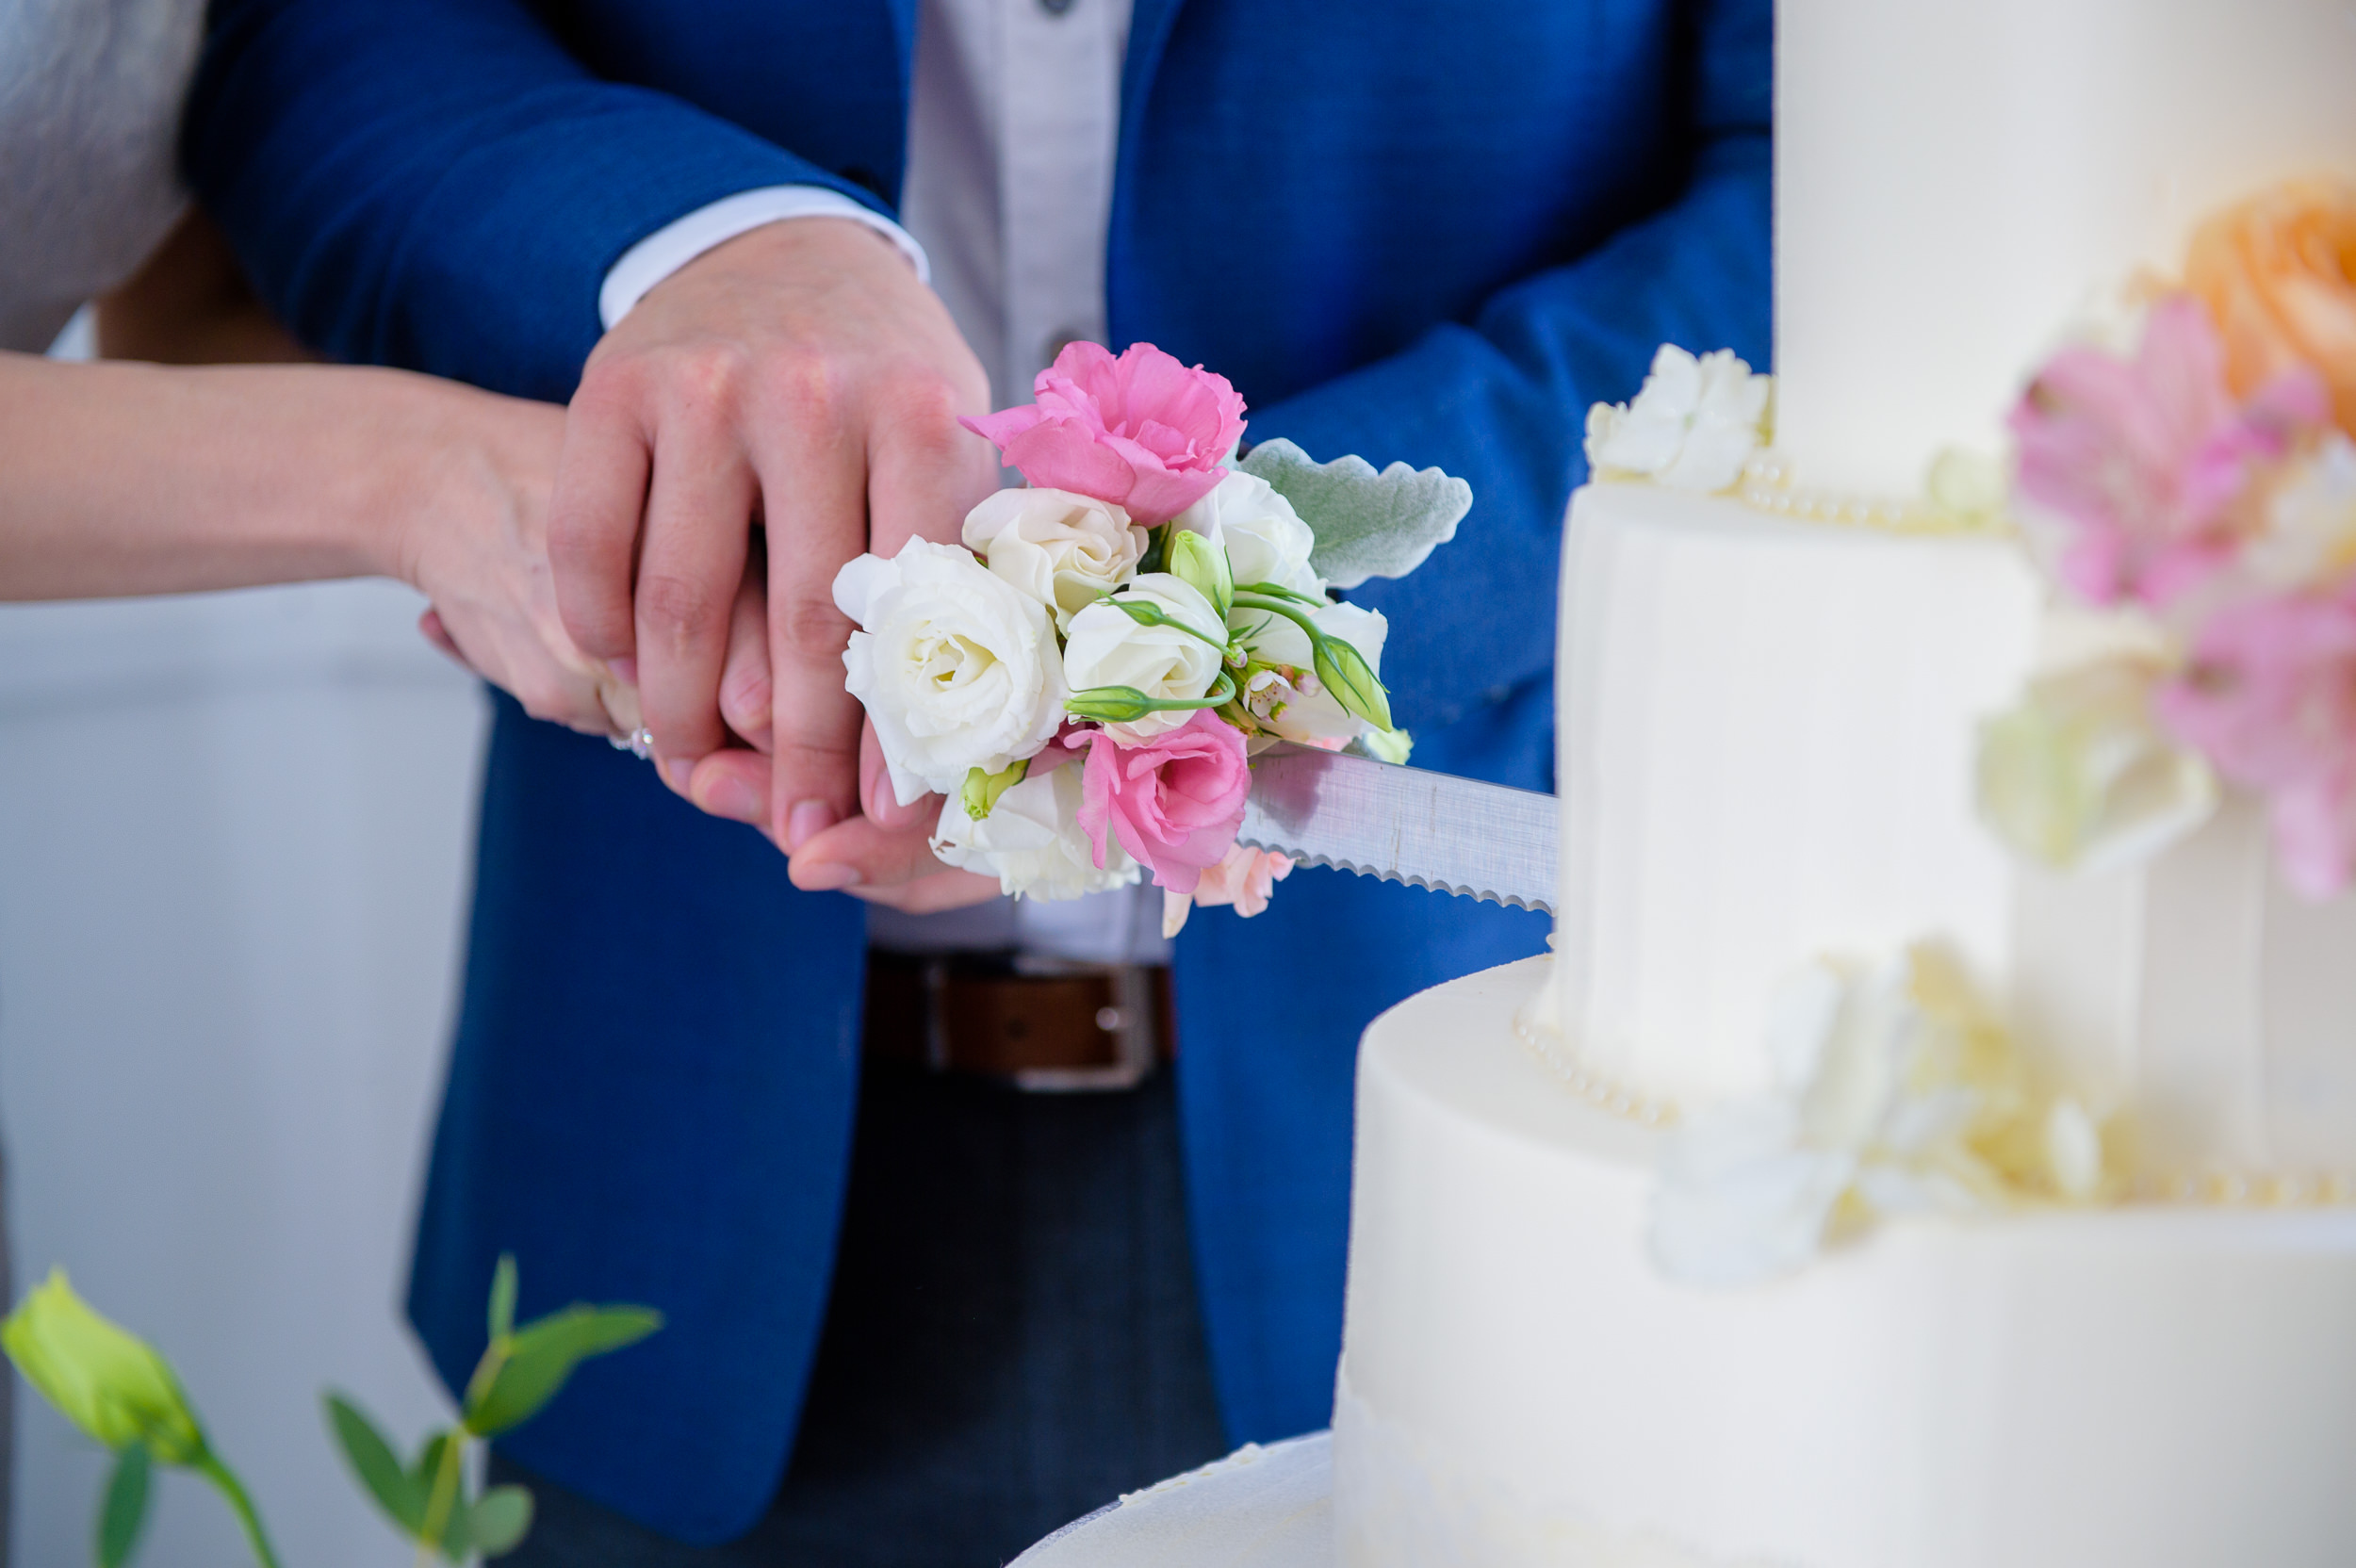 ROM wedding cake cutting